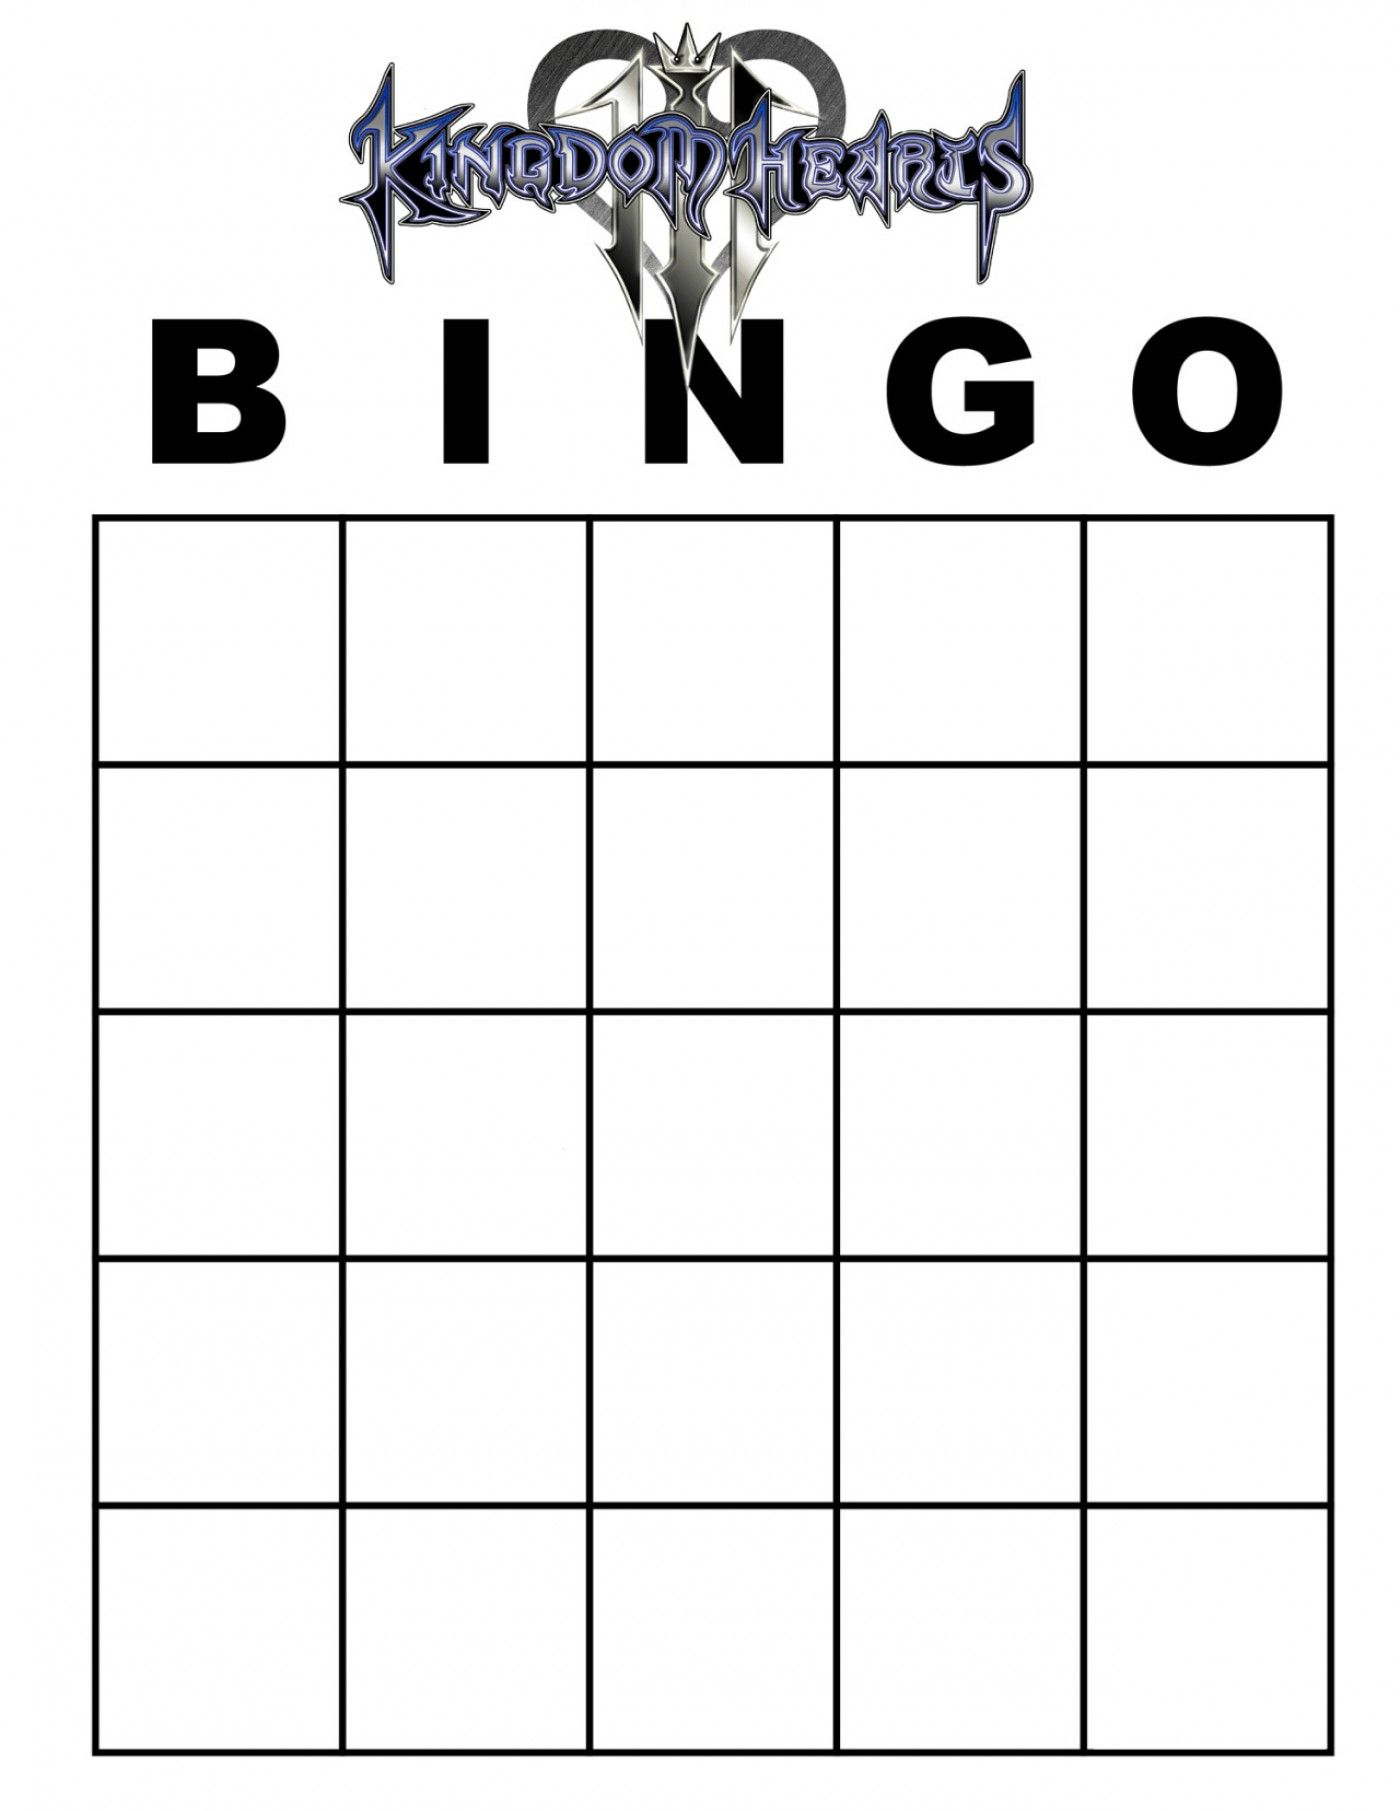 The Extraordinary 002 Blank Bingo Card Template Ideas Stirring Excel 5x5 For Bingo Card Template Word Phot Bingo Card Template Blank Bingo Cards Bingo Template